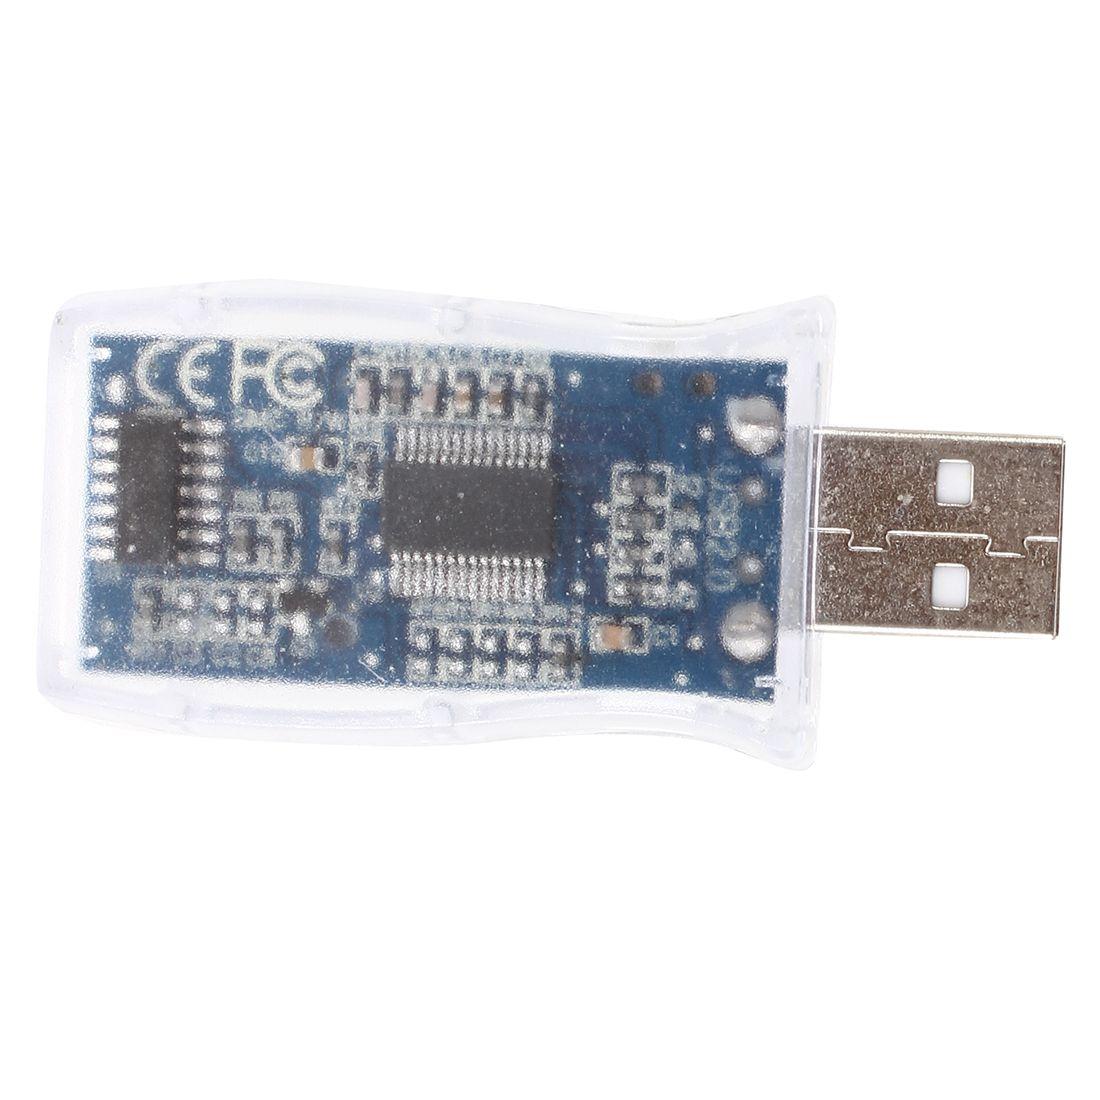 SIM Card Reader Writer Cloner Edit Copy Backup GSM CDMA USB Cuddly